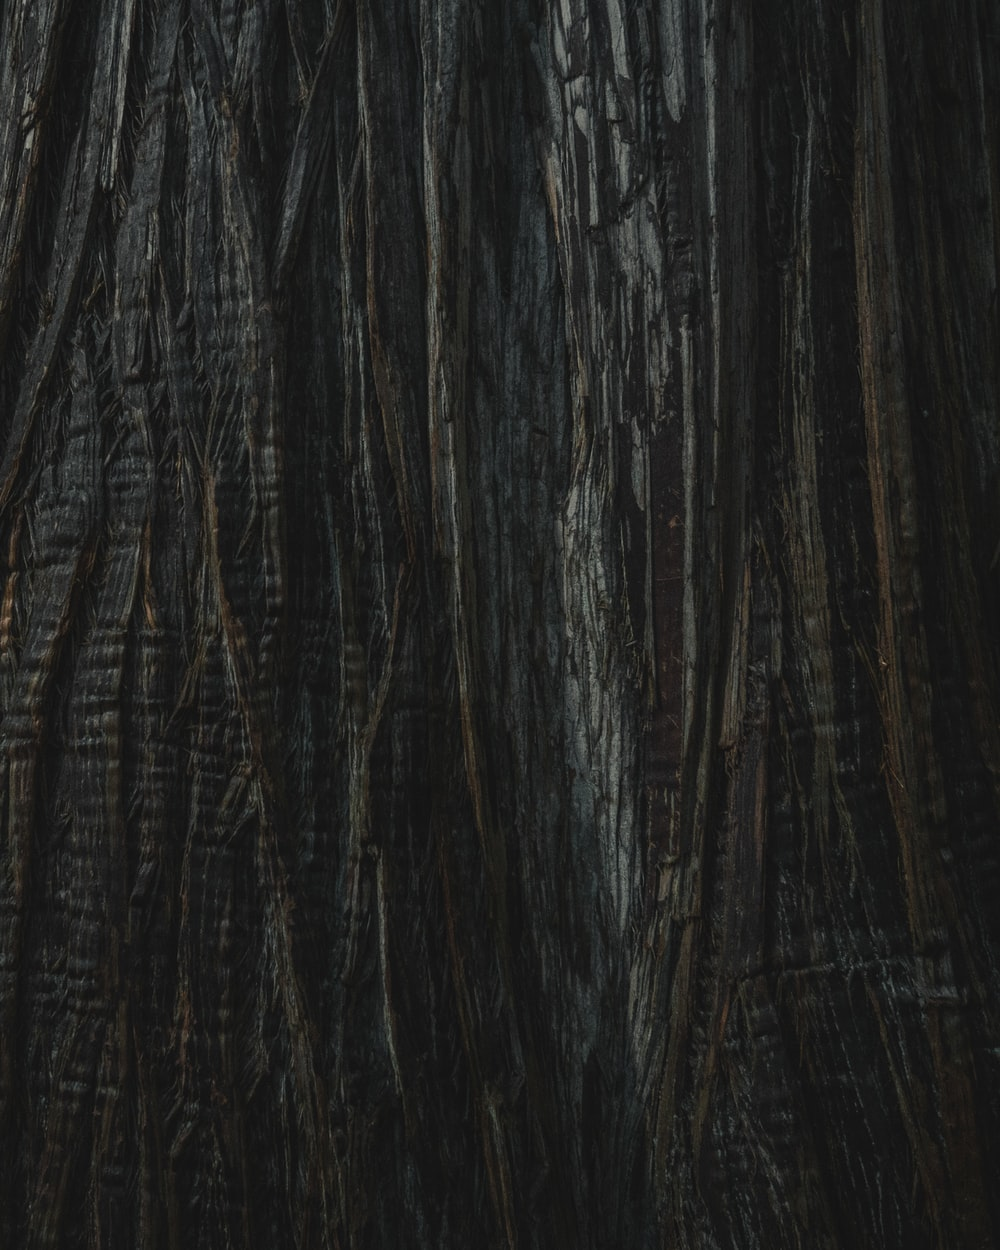 900 Wood Background Images Download HD Backgrounds on Unsplash 1000x1250